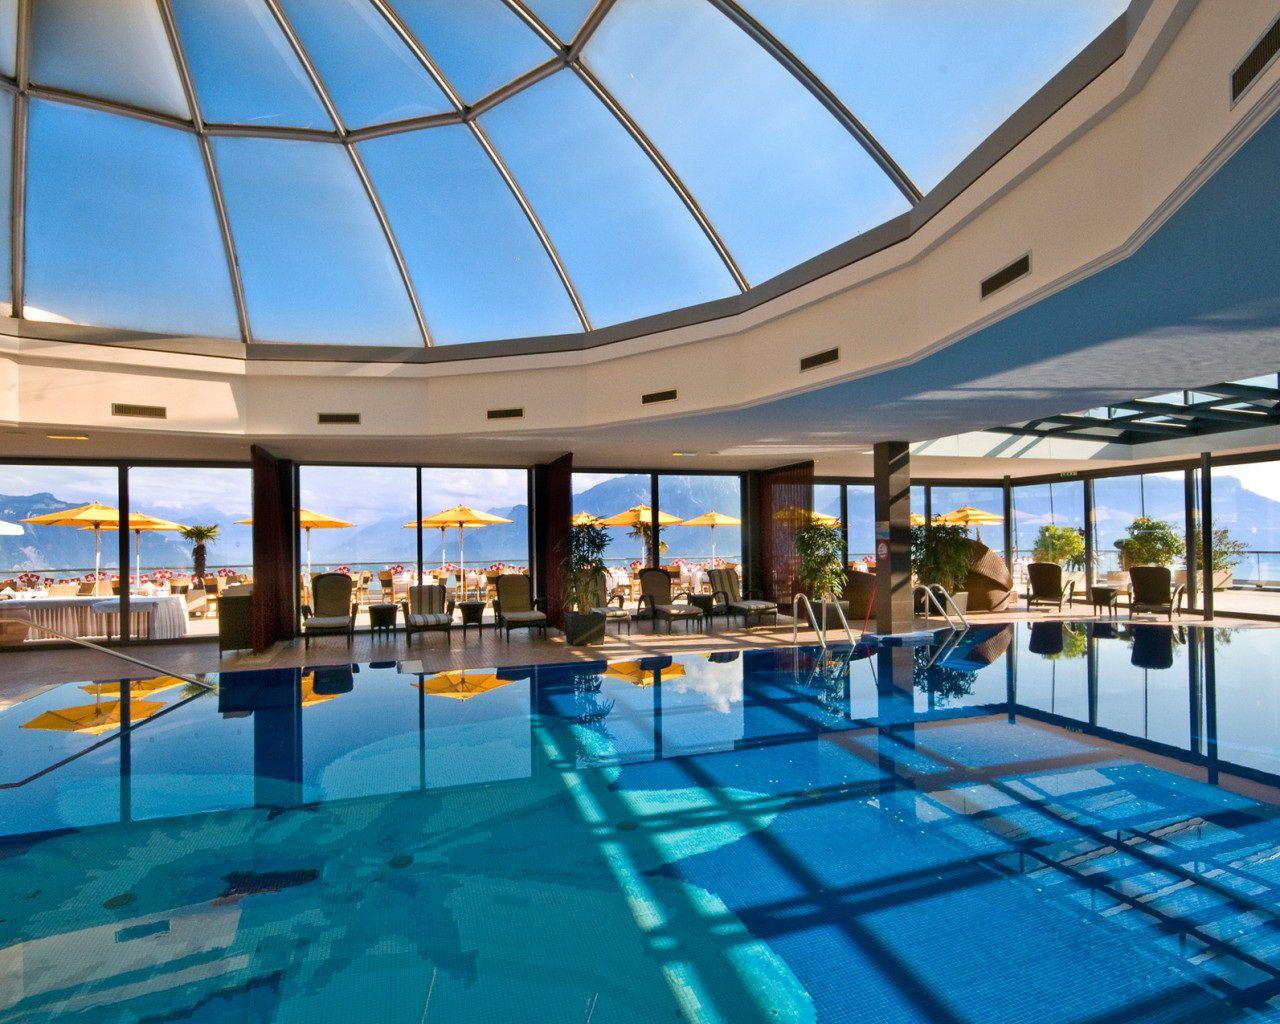 Swimming pool givenchy spa le mirador kempinski for Best boutique hotels geneva